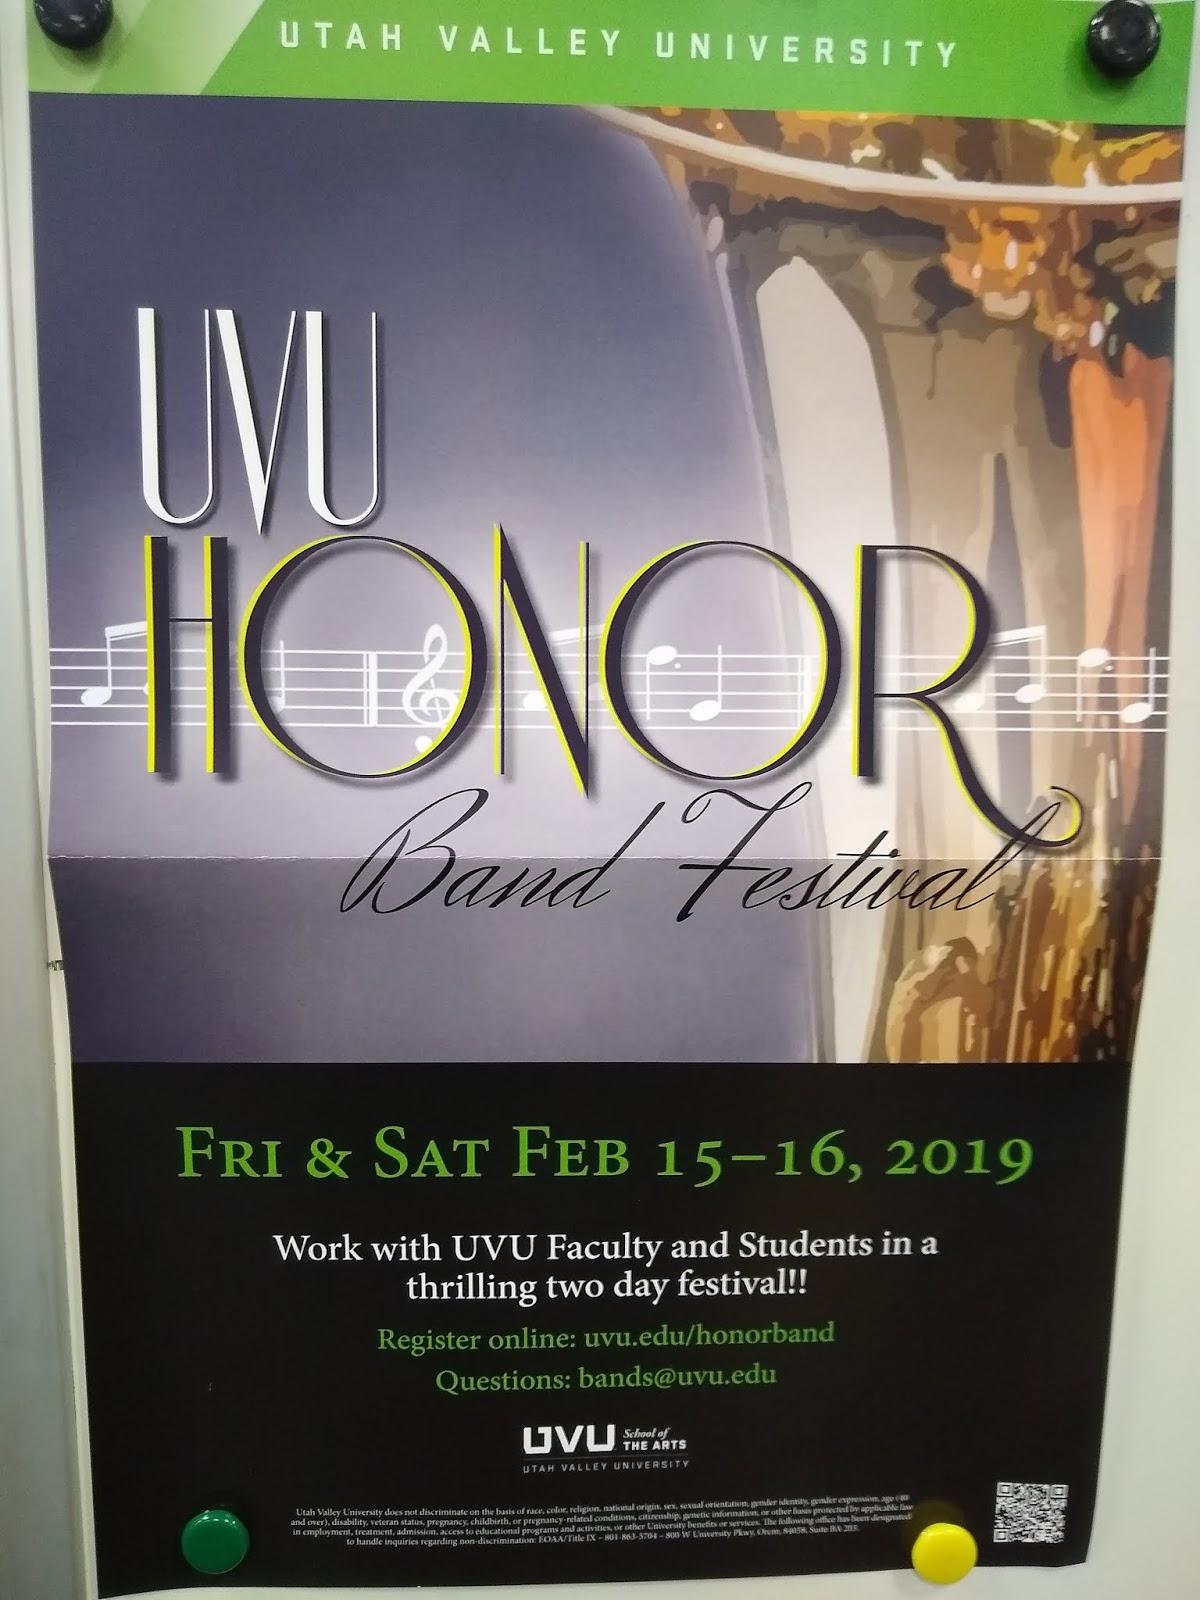 Uvu Academic Calendar.Copper Hills Band Boosters Uvu Honor Band